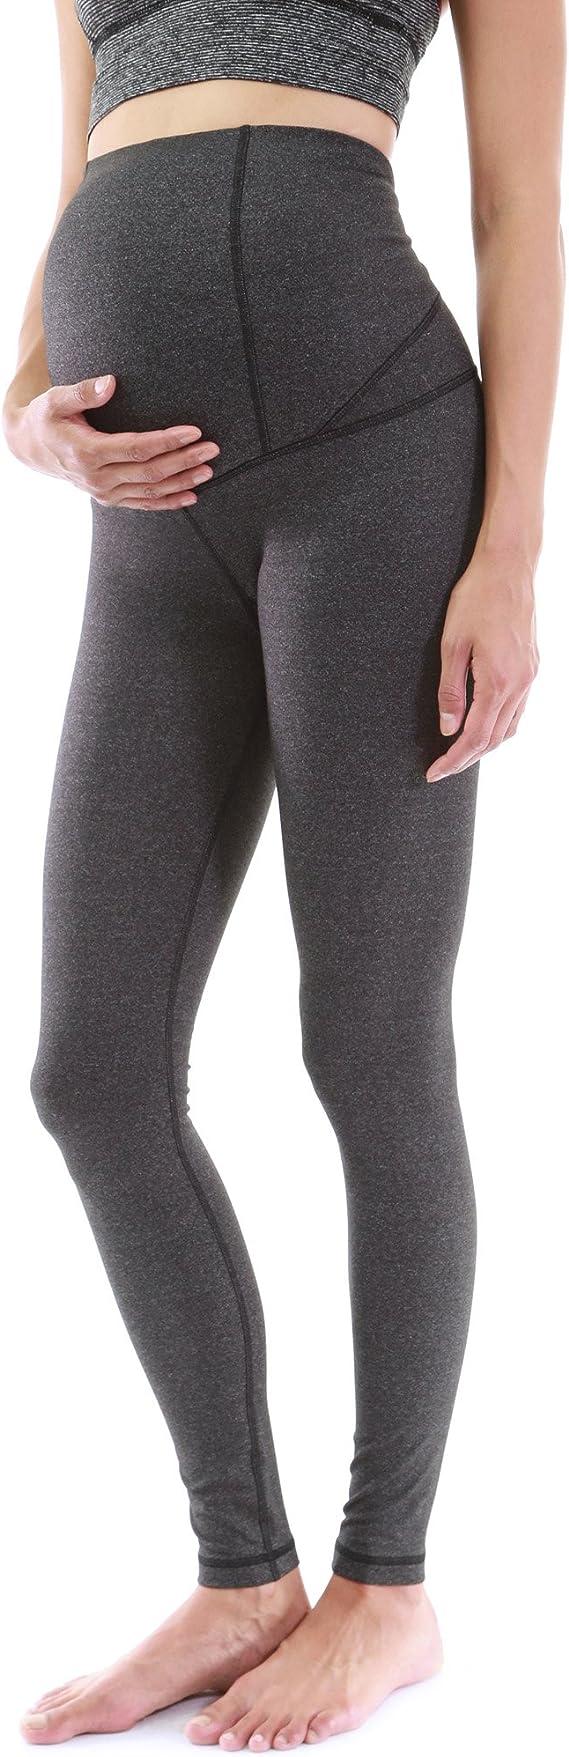 PattyBoutik Mama Mujer Que Forma la Serie Maternidad Pantalones de Yoga Legging